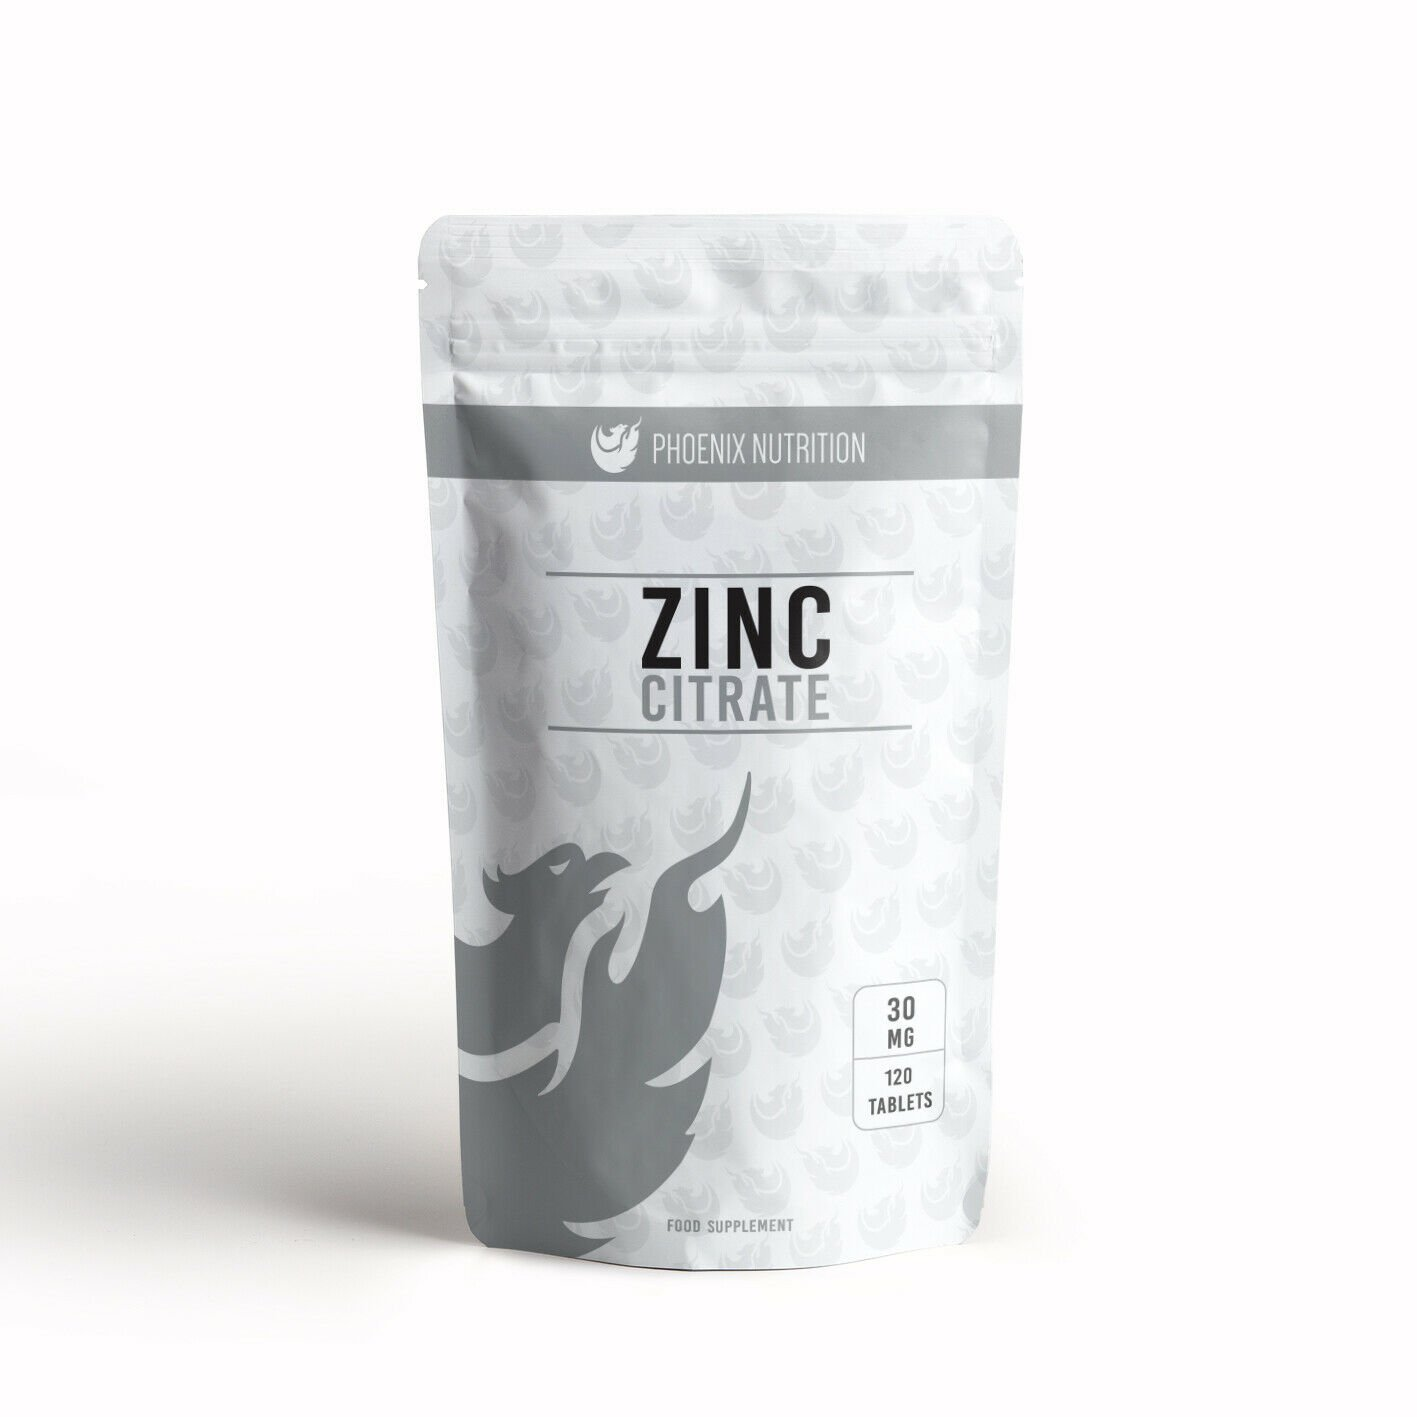 Zinc 30mg x 360 Tablets | Triple Strength, 300% RDA from 100mg Zinc Citrate